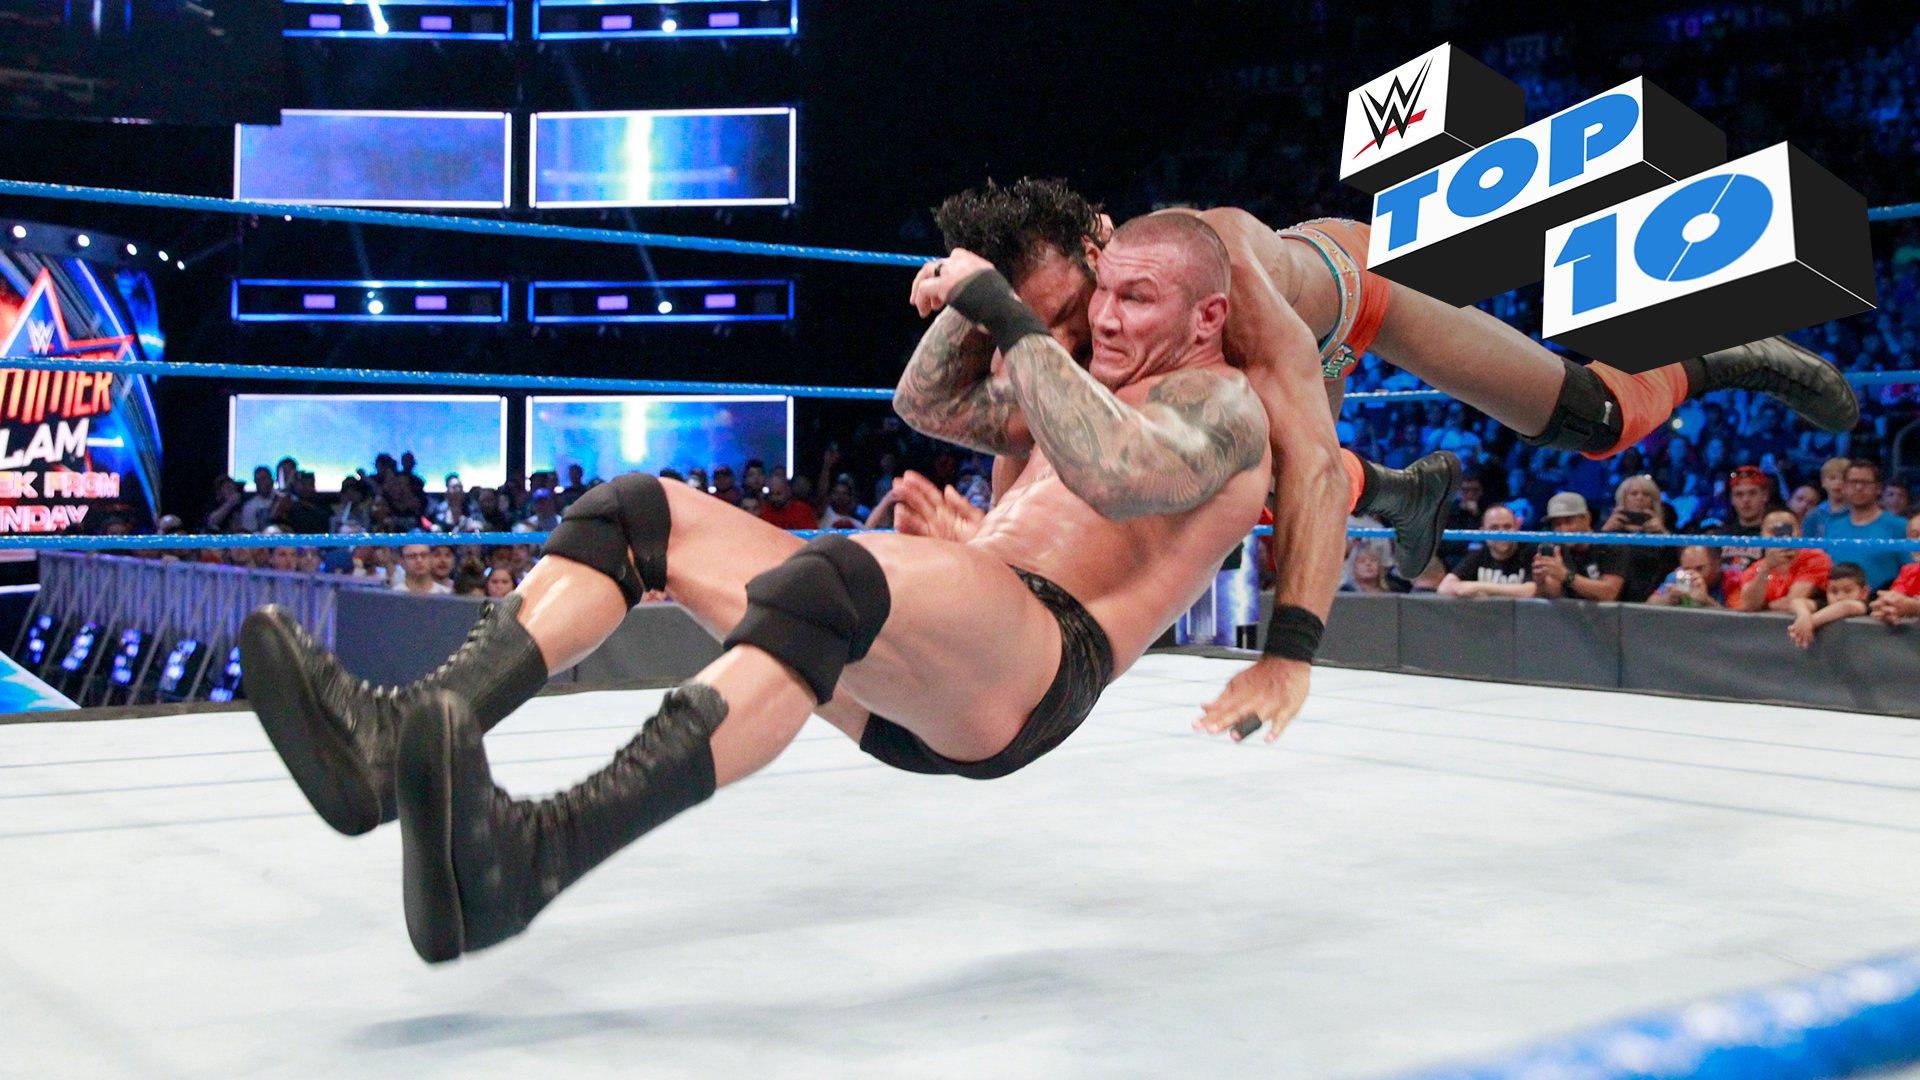 Top 10 momentów SmackDown LIVE: WWE Top 10 08.08.17